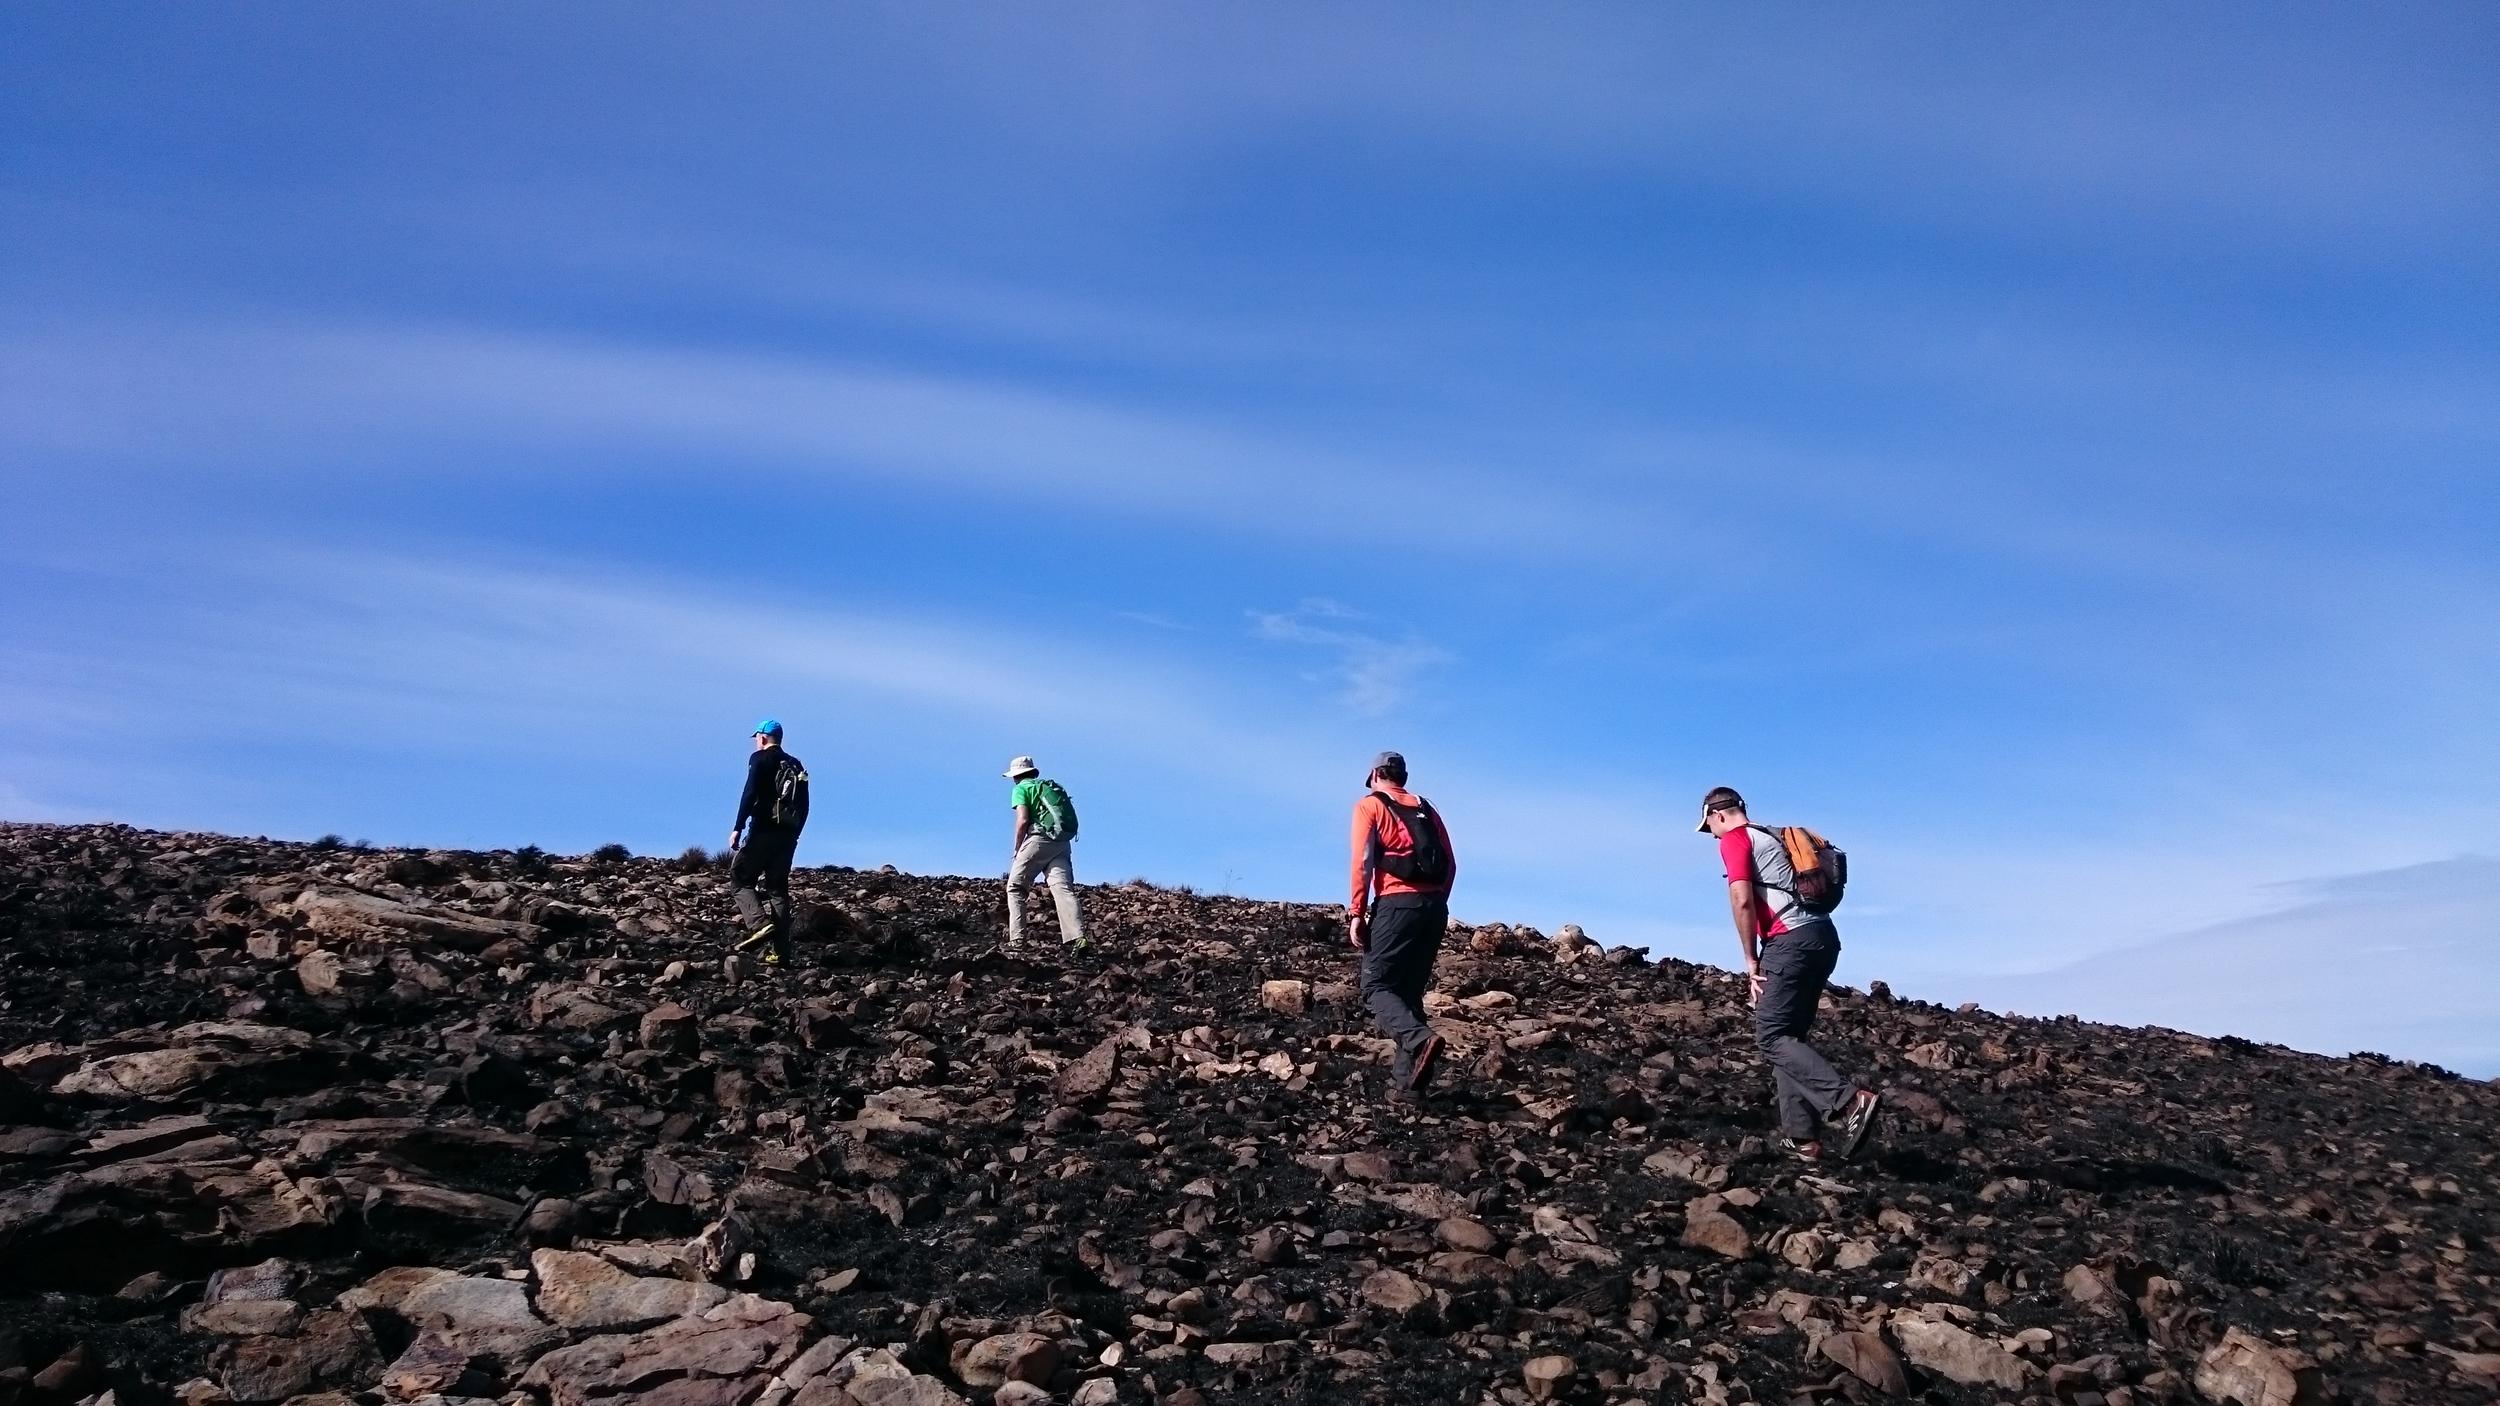 Hiking up one of the many burnt false peaks